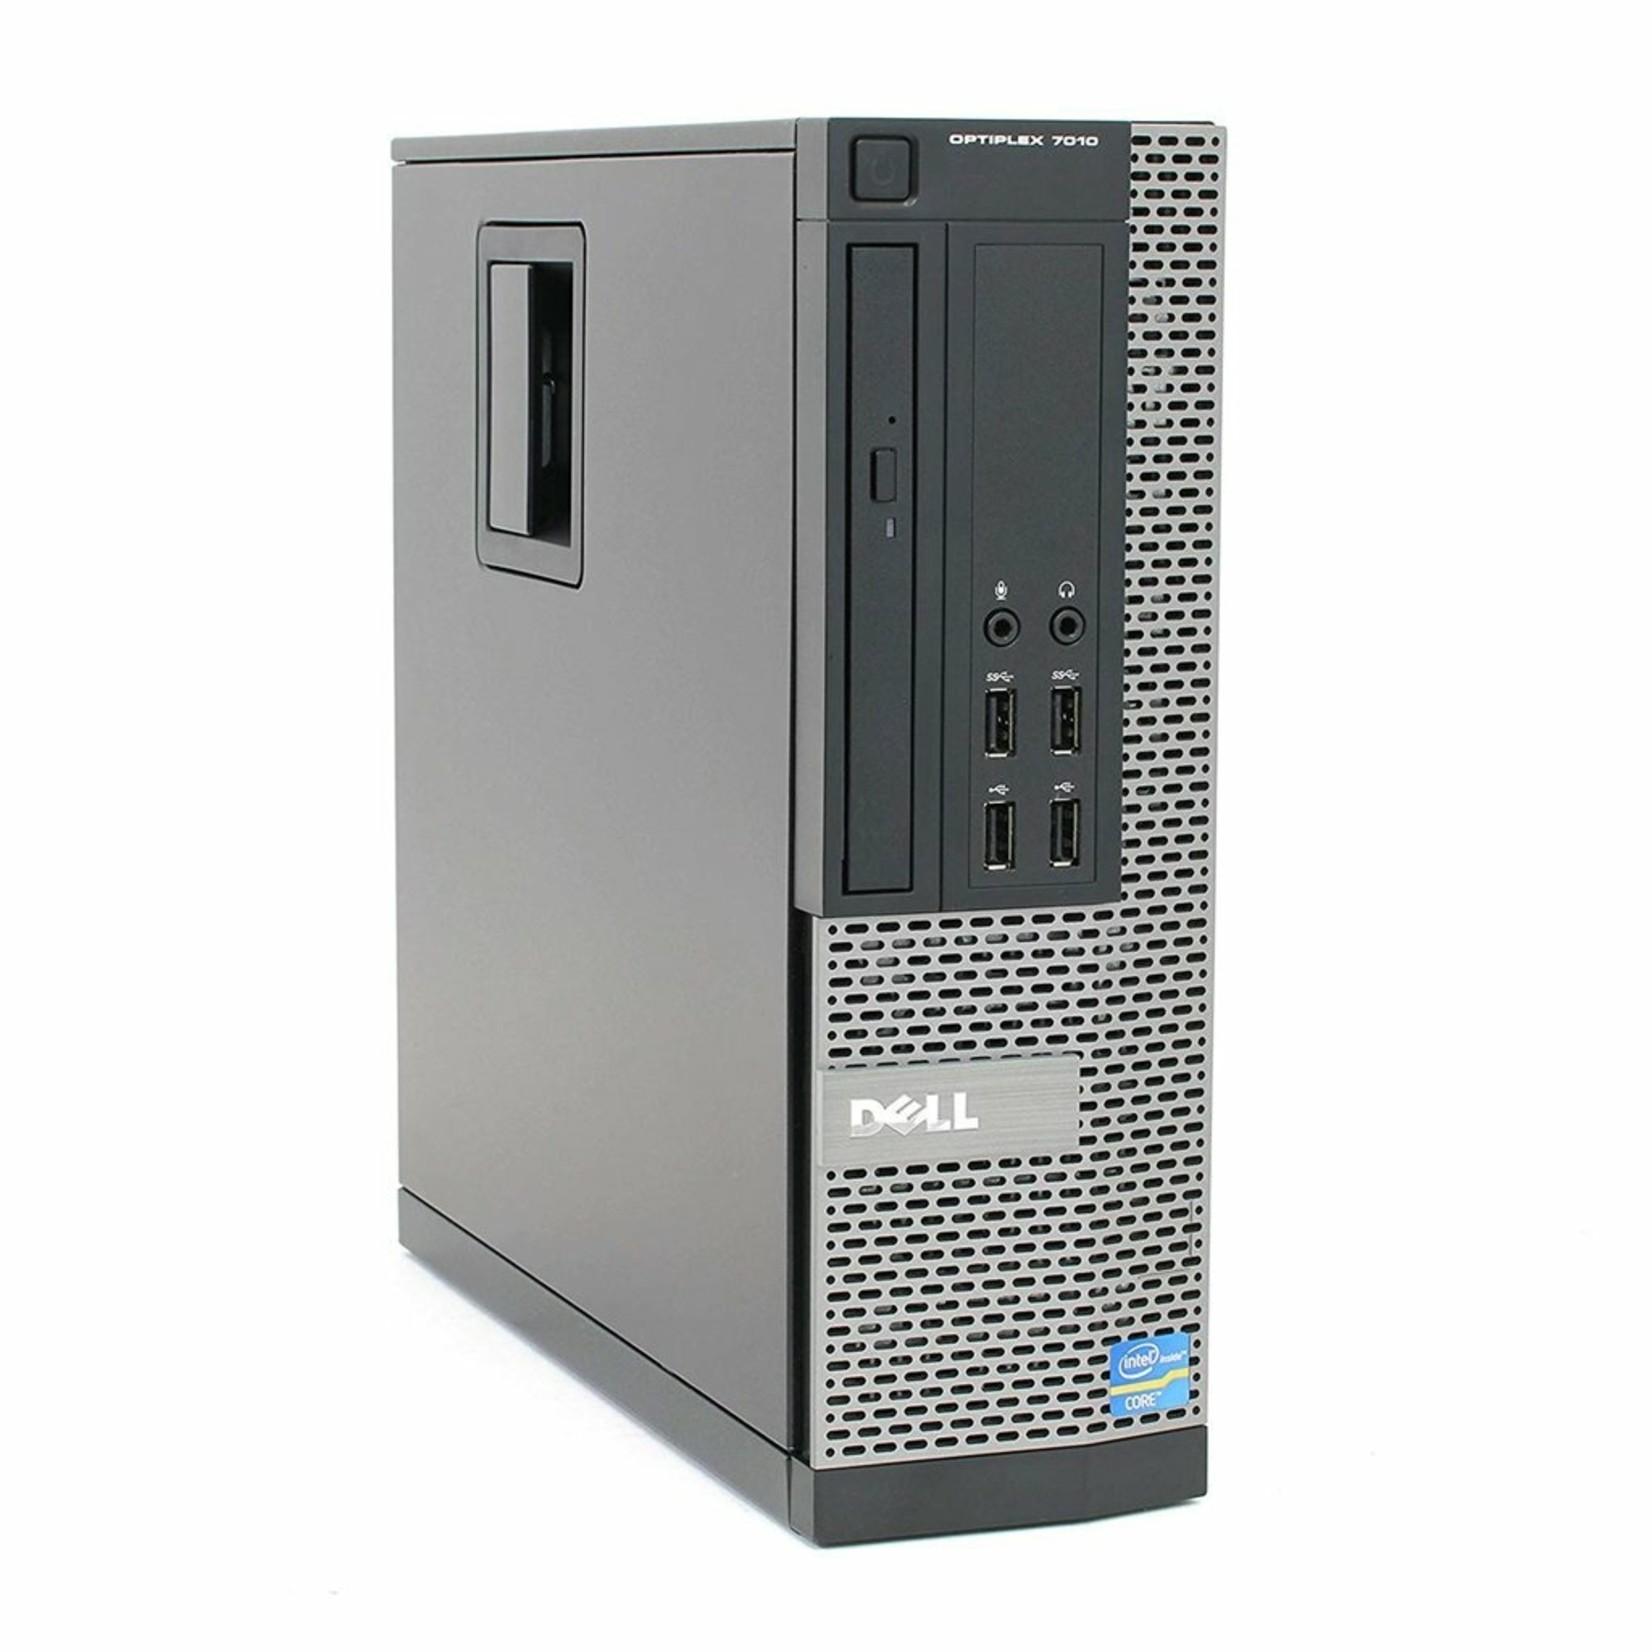 2013 Dell Optiplex 7010